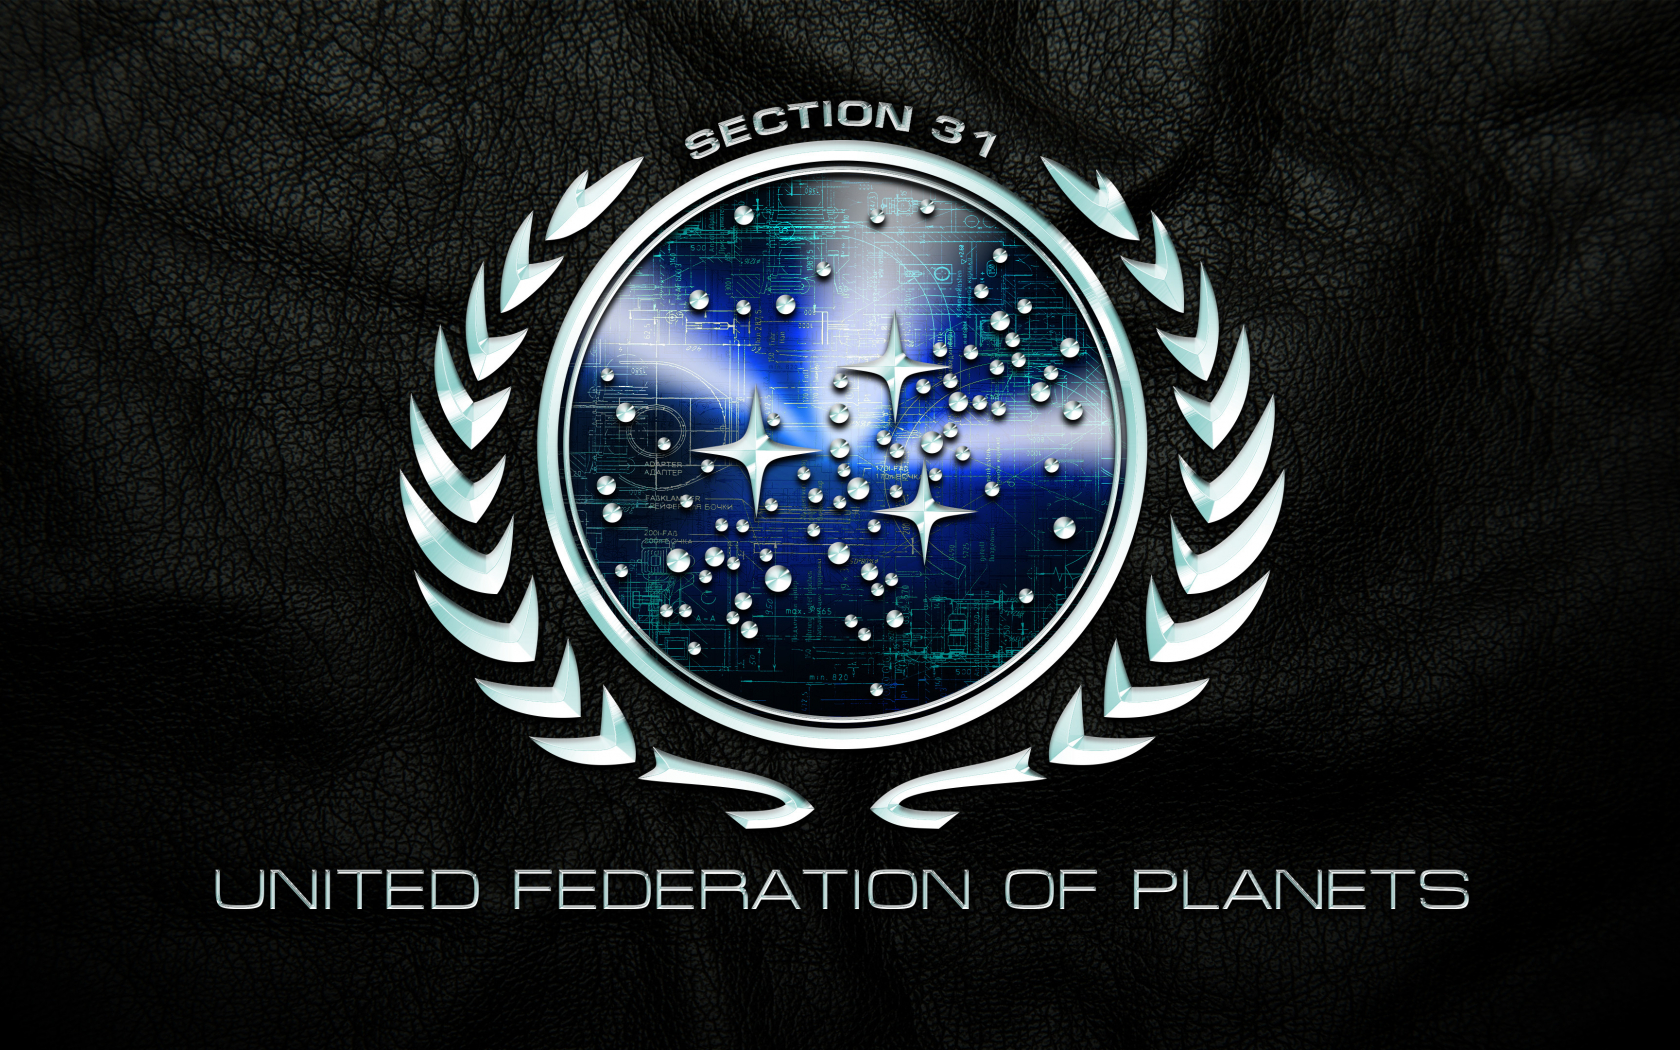 Free Download 77 Star Trek Wallpapers On Wallpaperplay 3840x2160